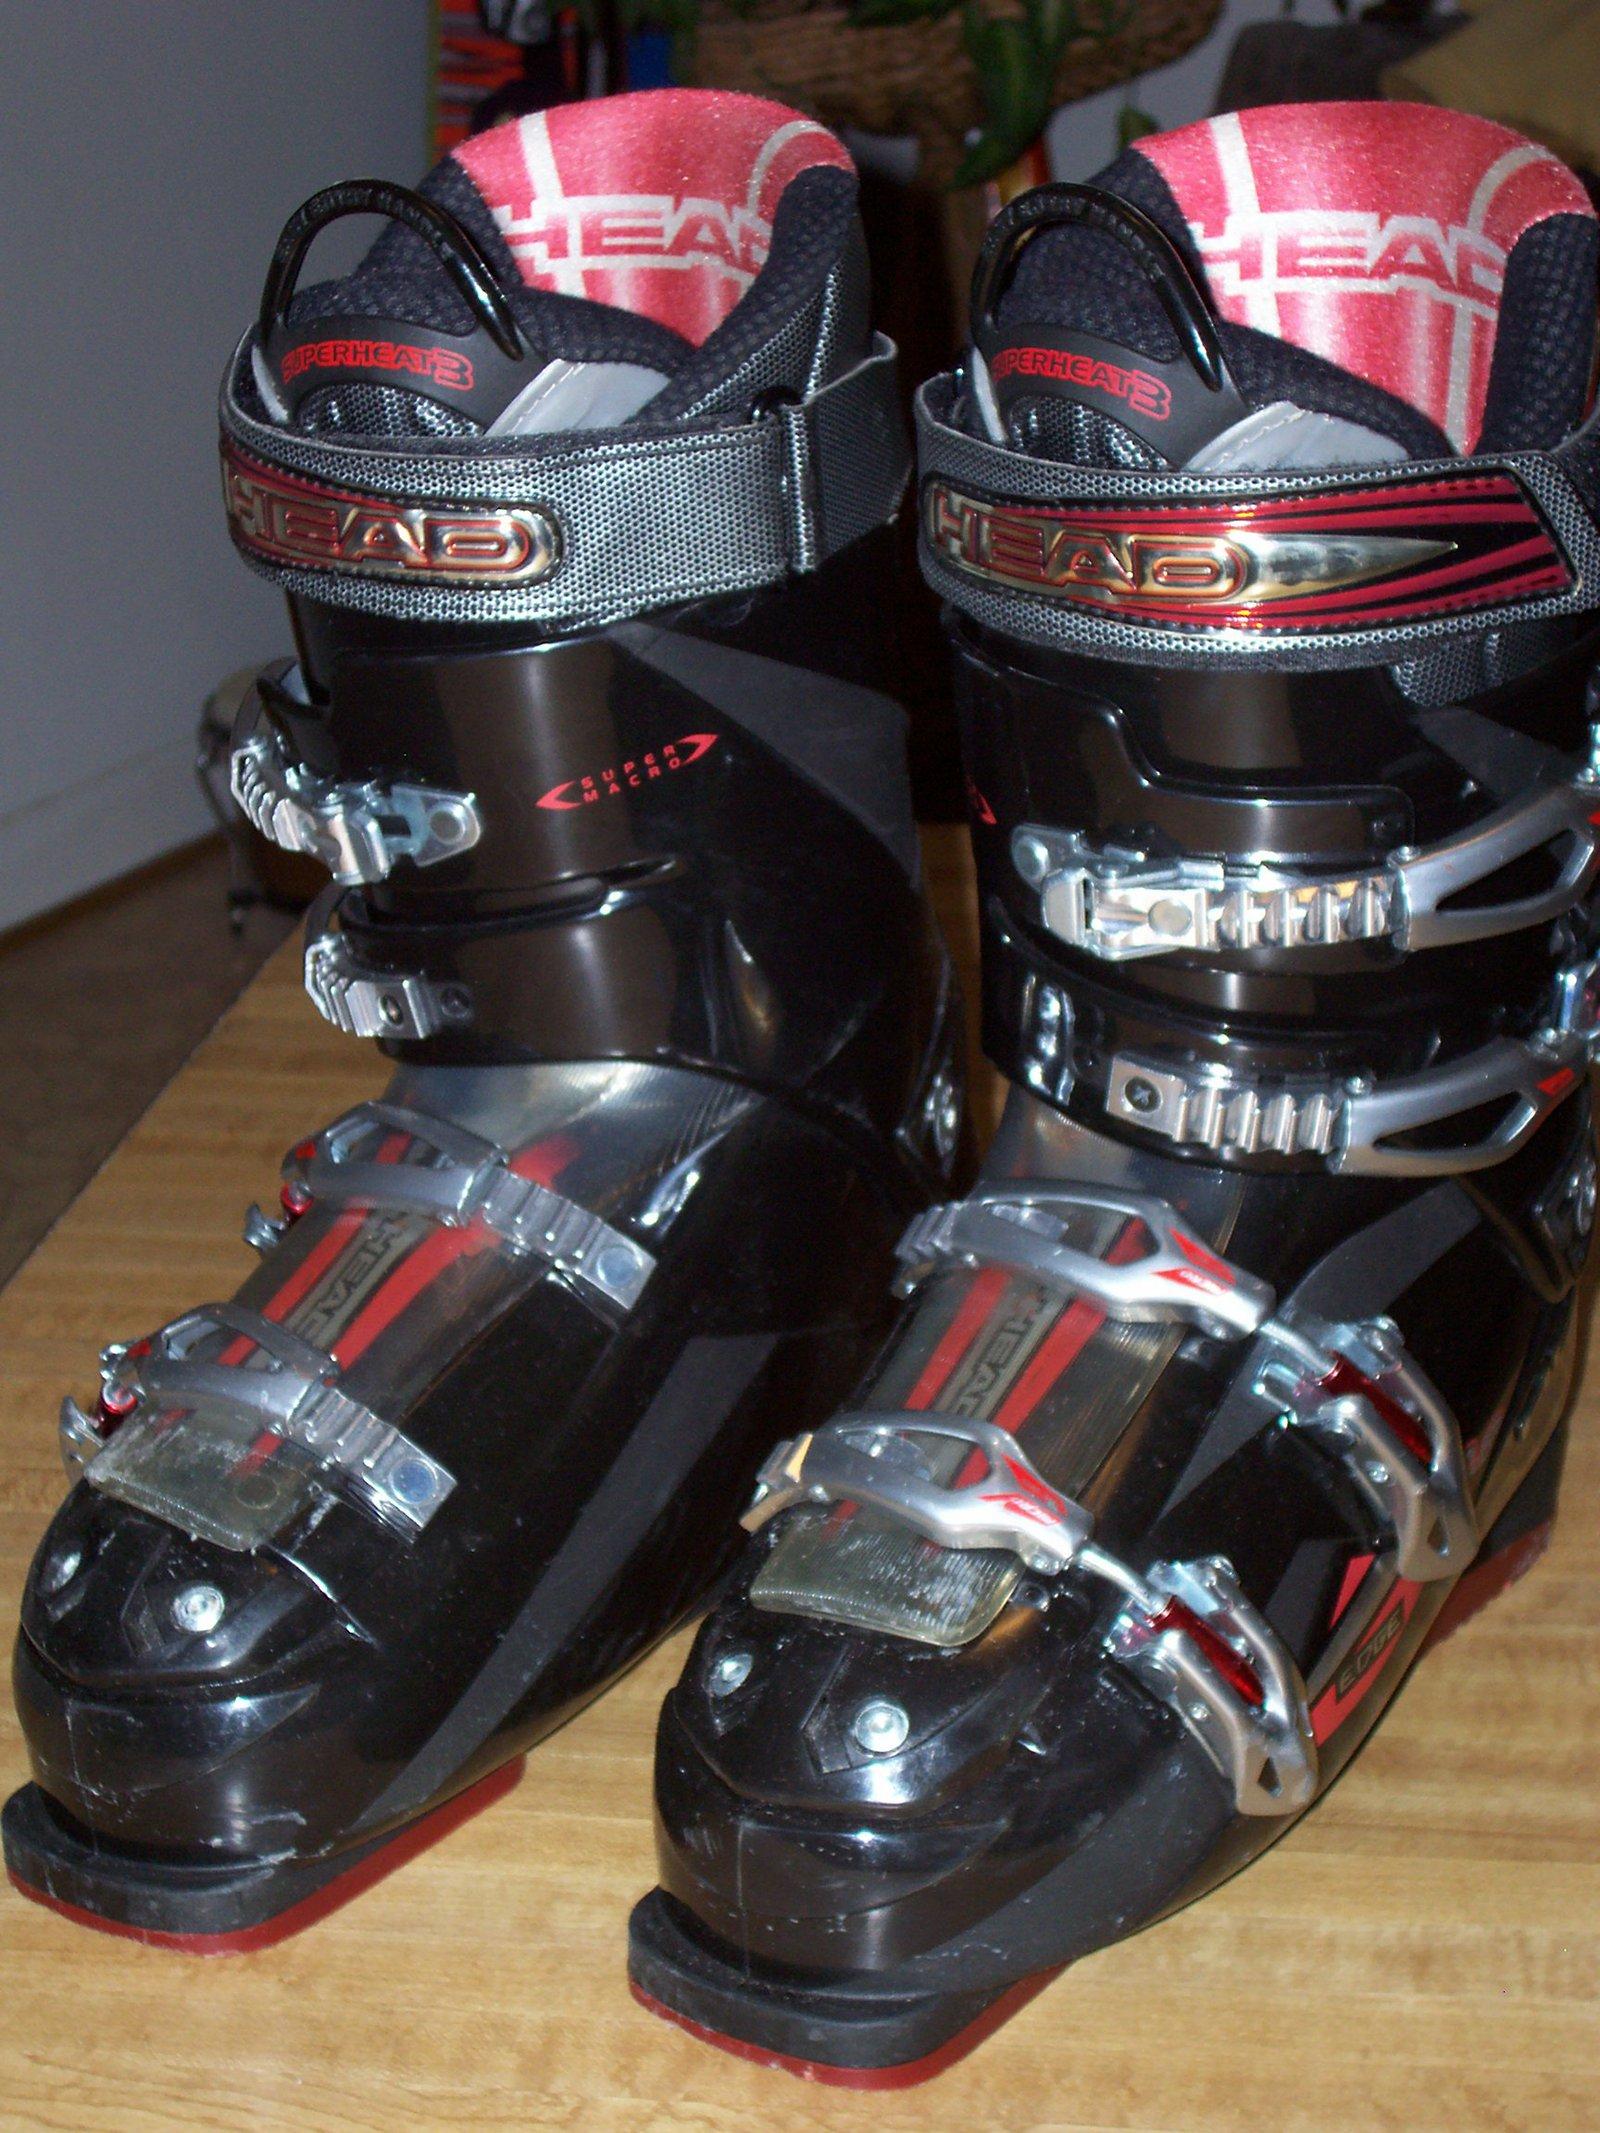 Head boots